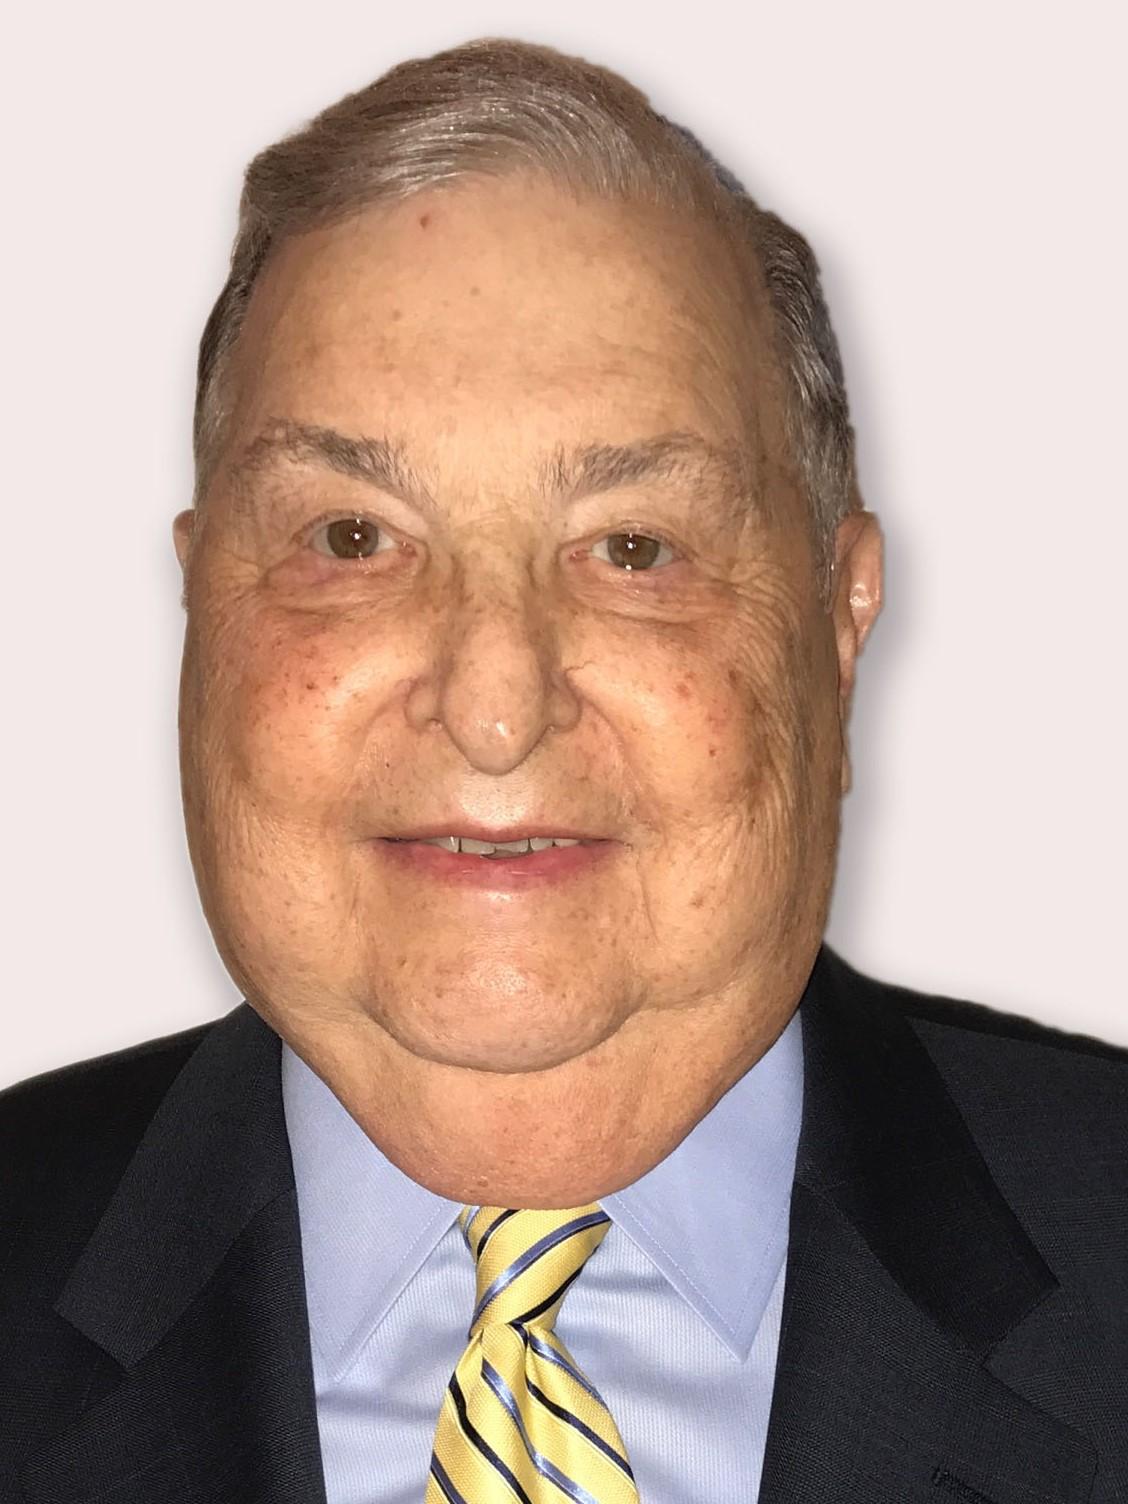 RonaldGoldman